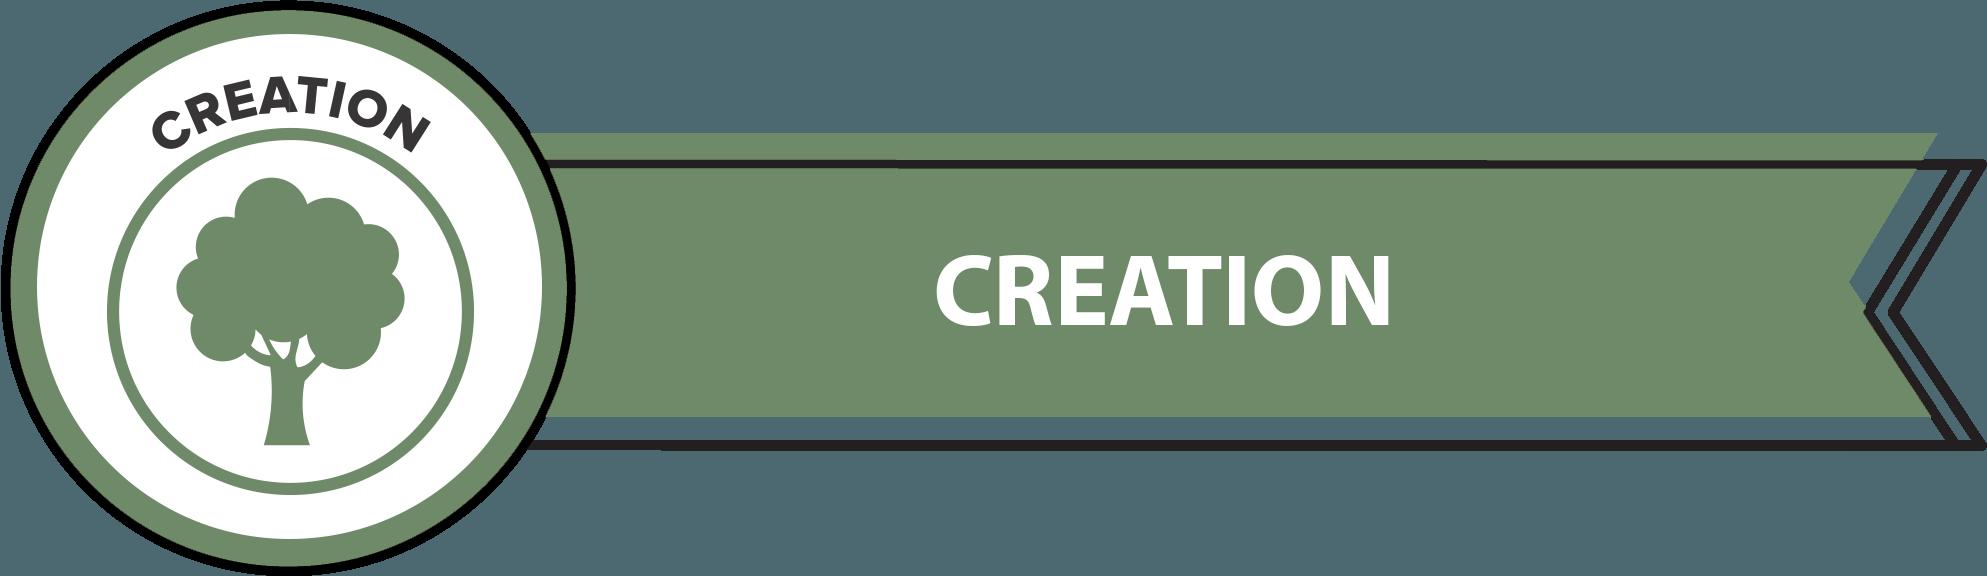 Creation Concept